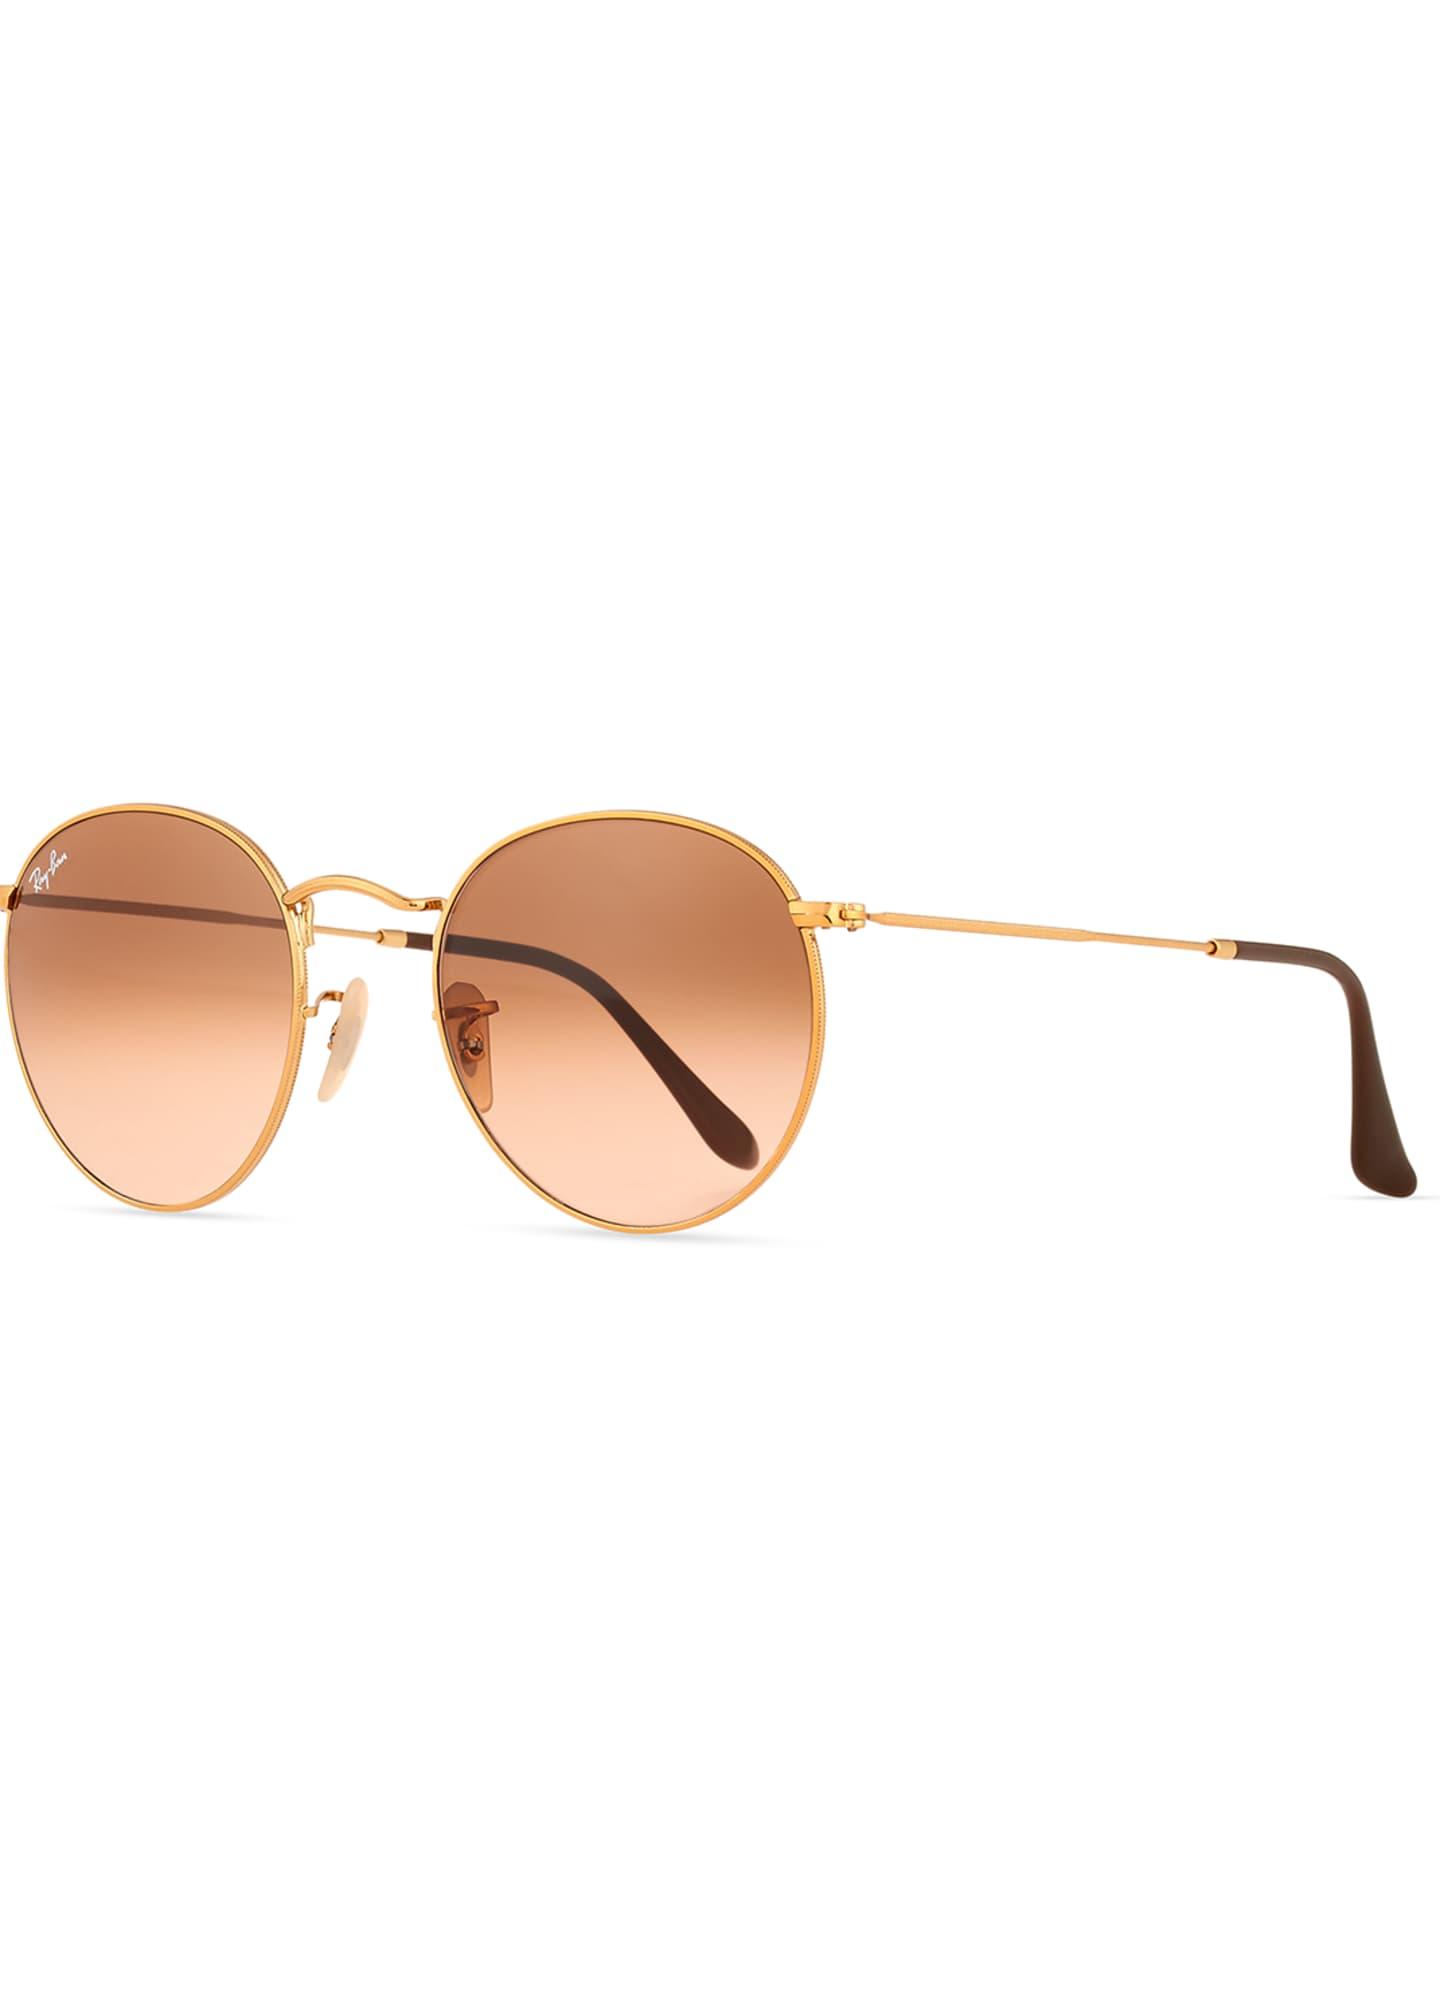 Ray-Ban Gradient Round Metal Sunglasses